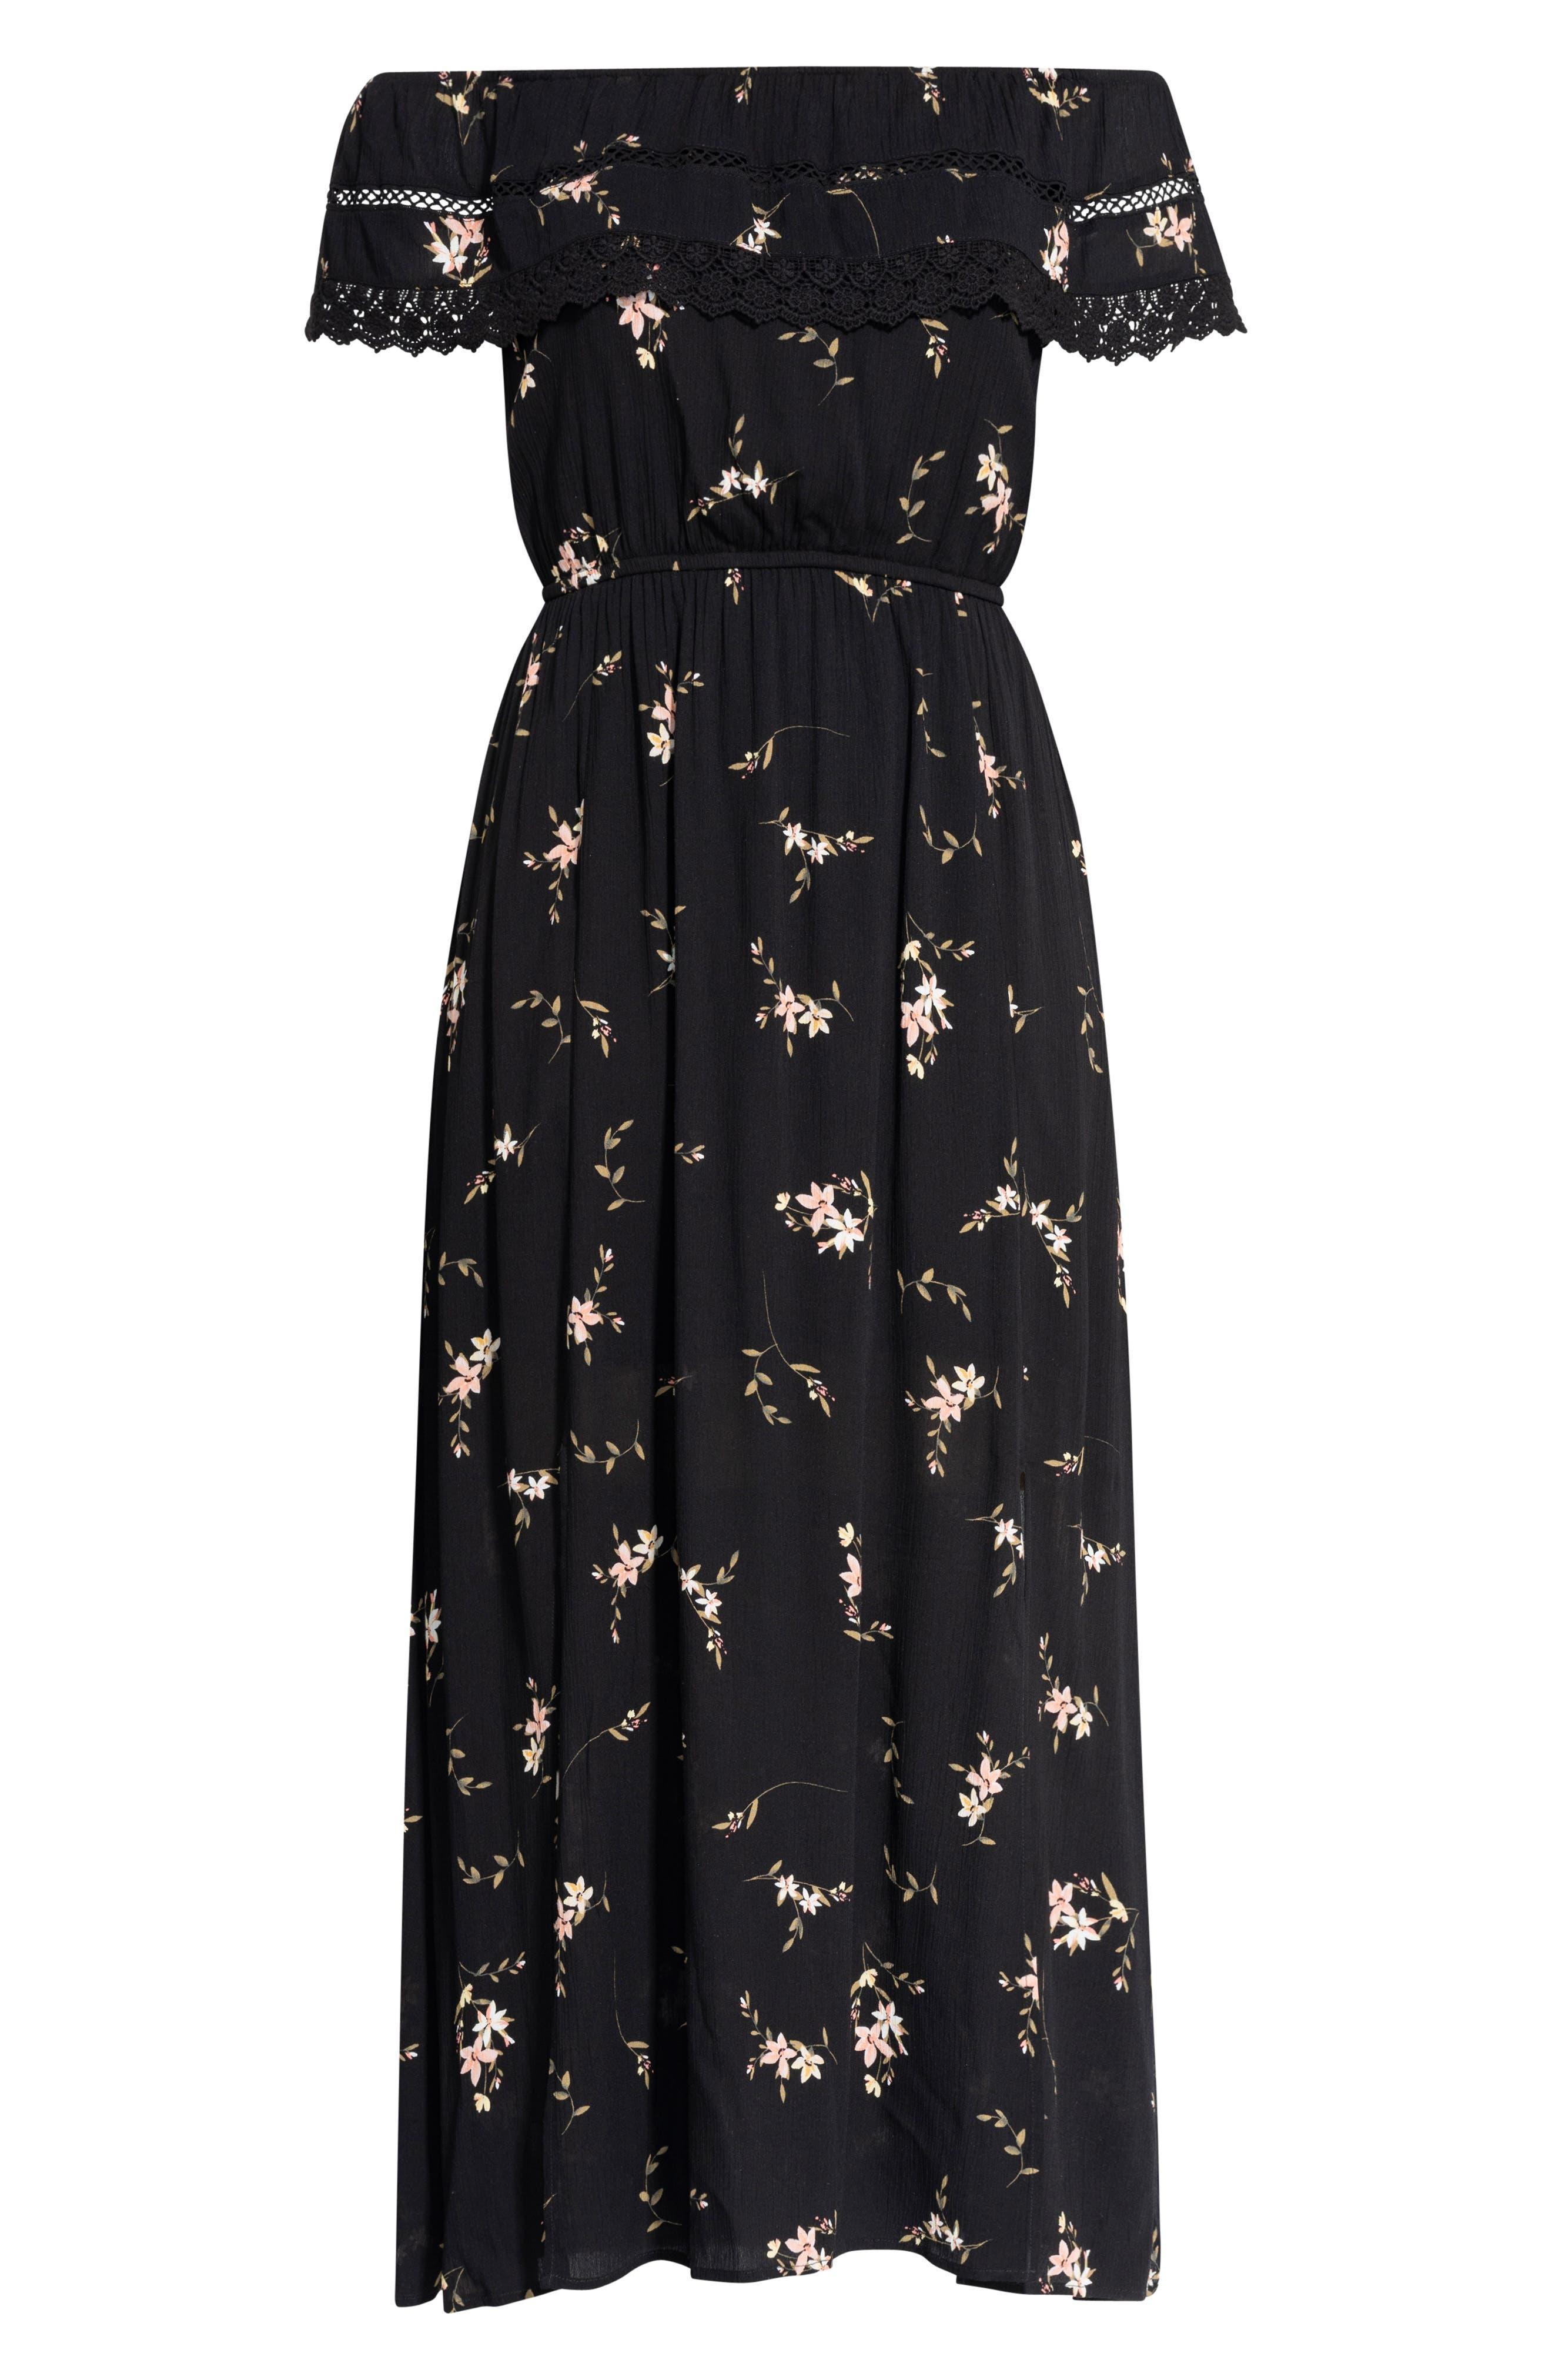 CITY CHIC, Off the Shoulder Floral Maxi Dress, Alternate thumbnail 3, color, AERIAL FLORAL